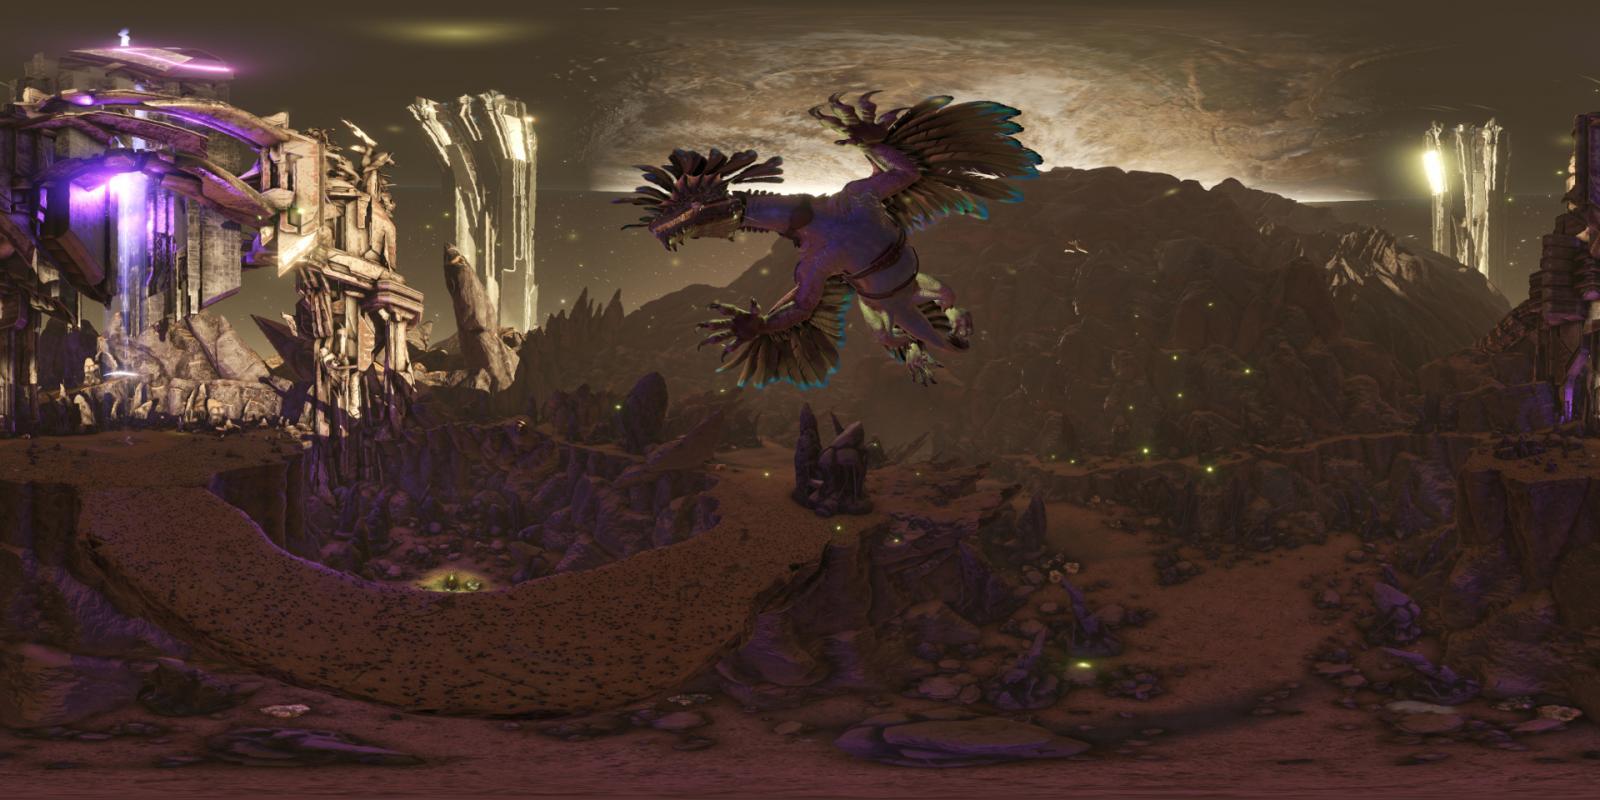 large.5a62bab0ba00b_Vakarian-Thesurfaceatsunrise-Panoramic360Steroscopic3D.jpg